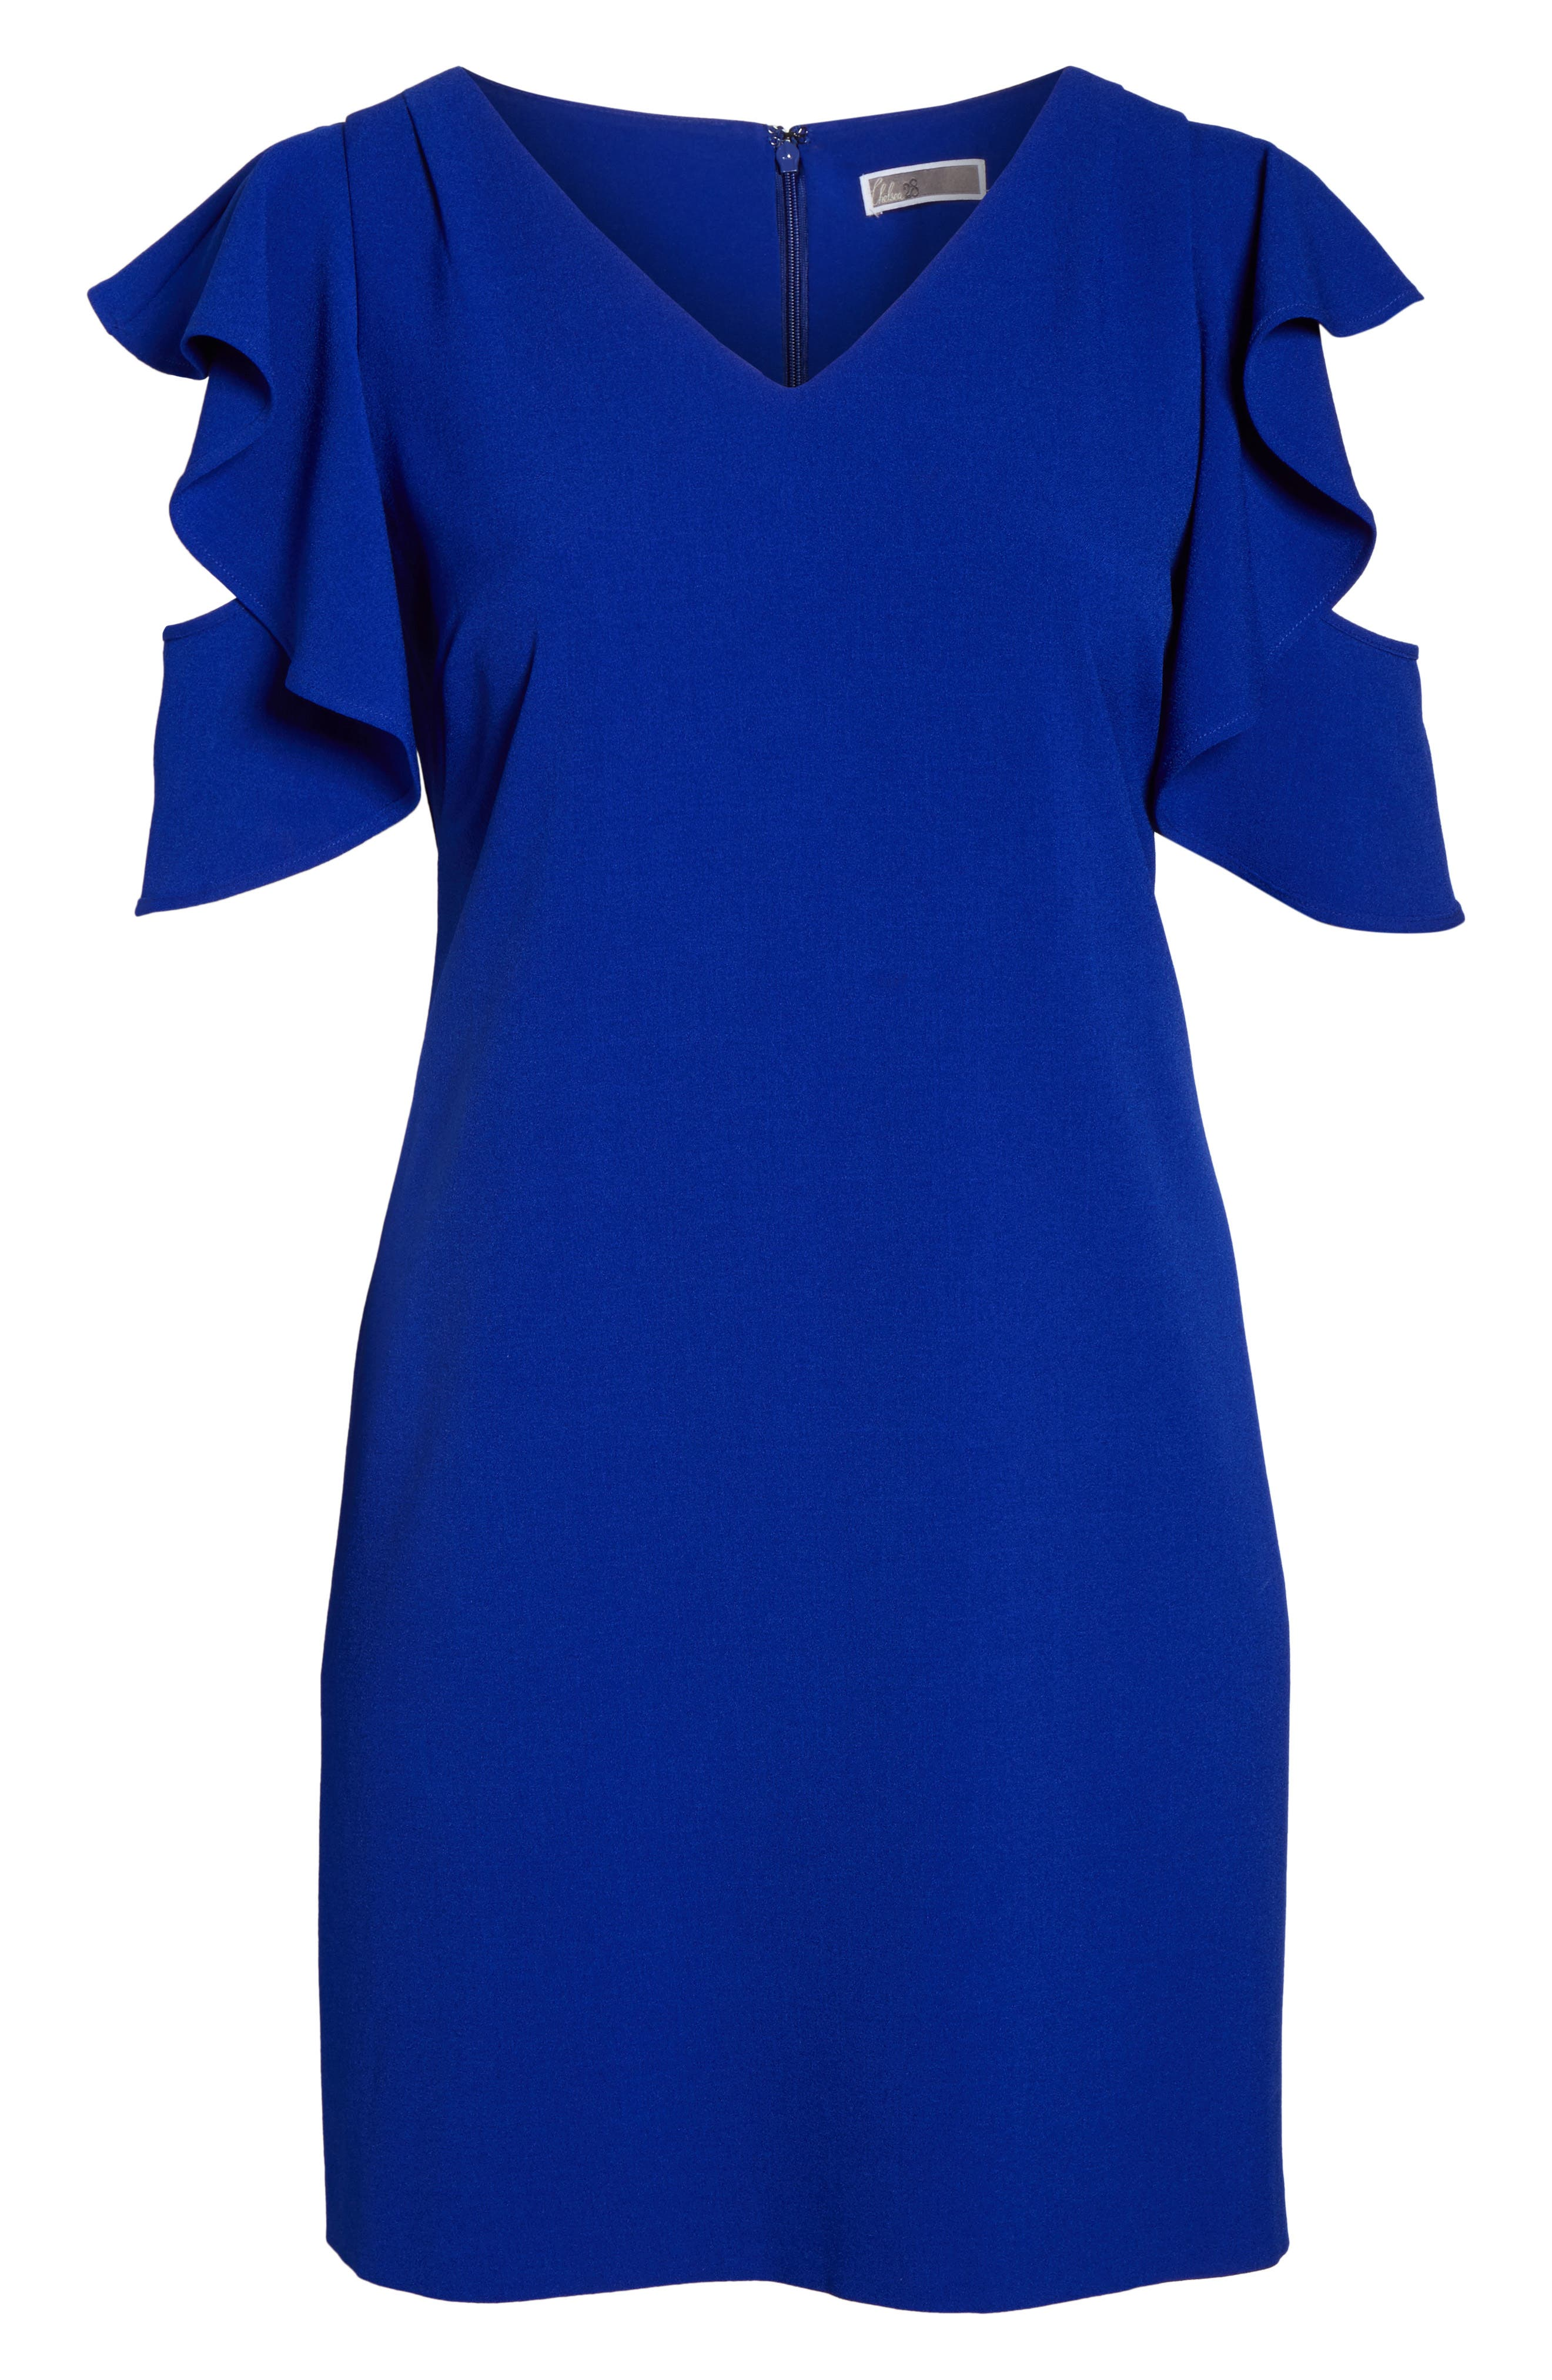 Ruffle Cold Shoulder Shift Dress,                             Alternate thumbnail 6, color,                             Blue Surf